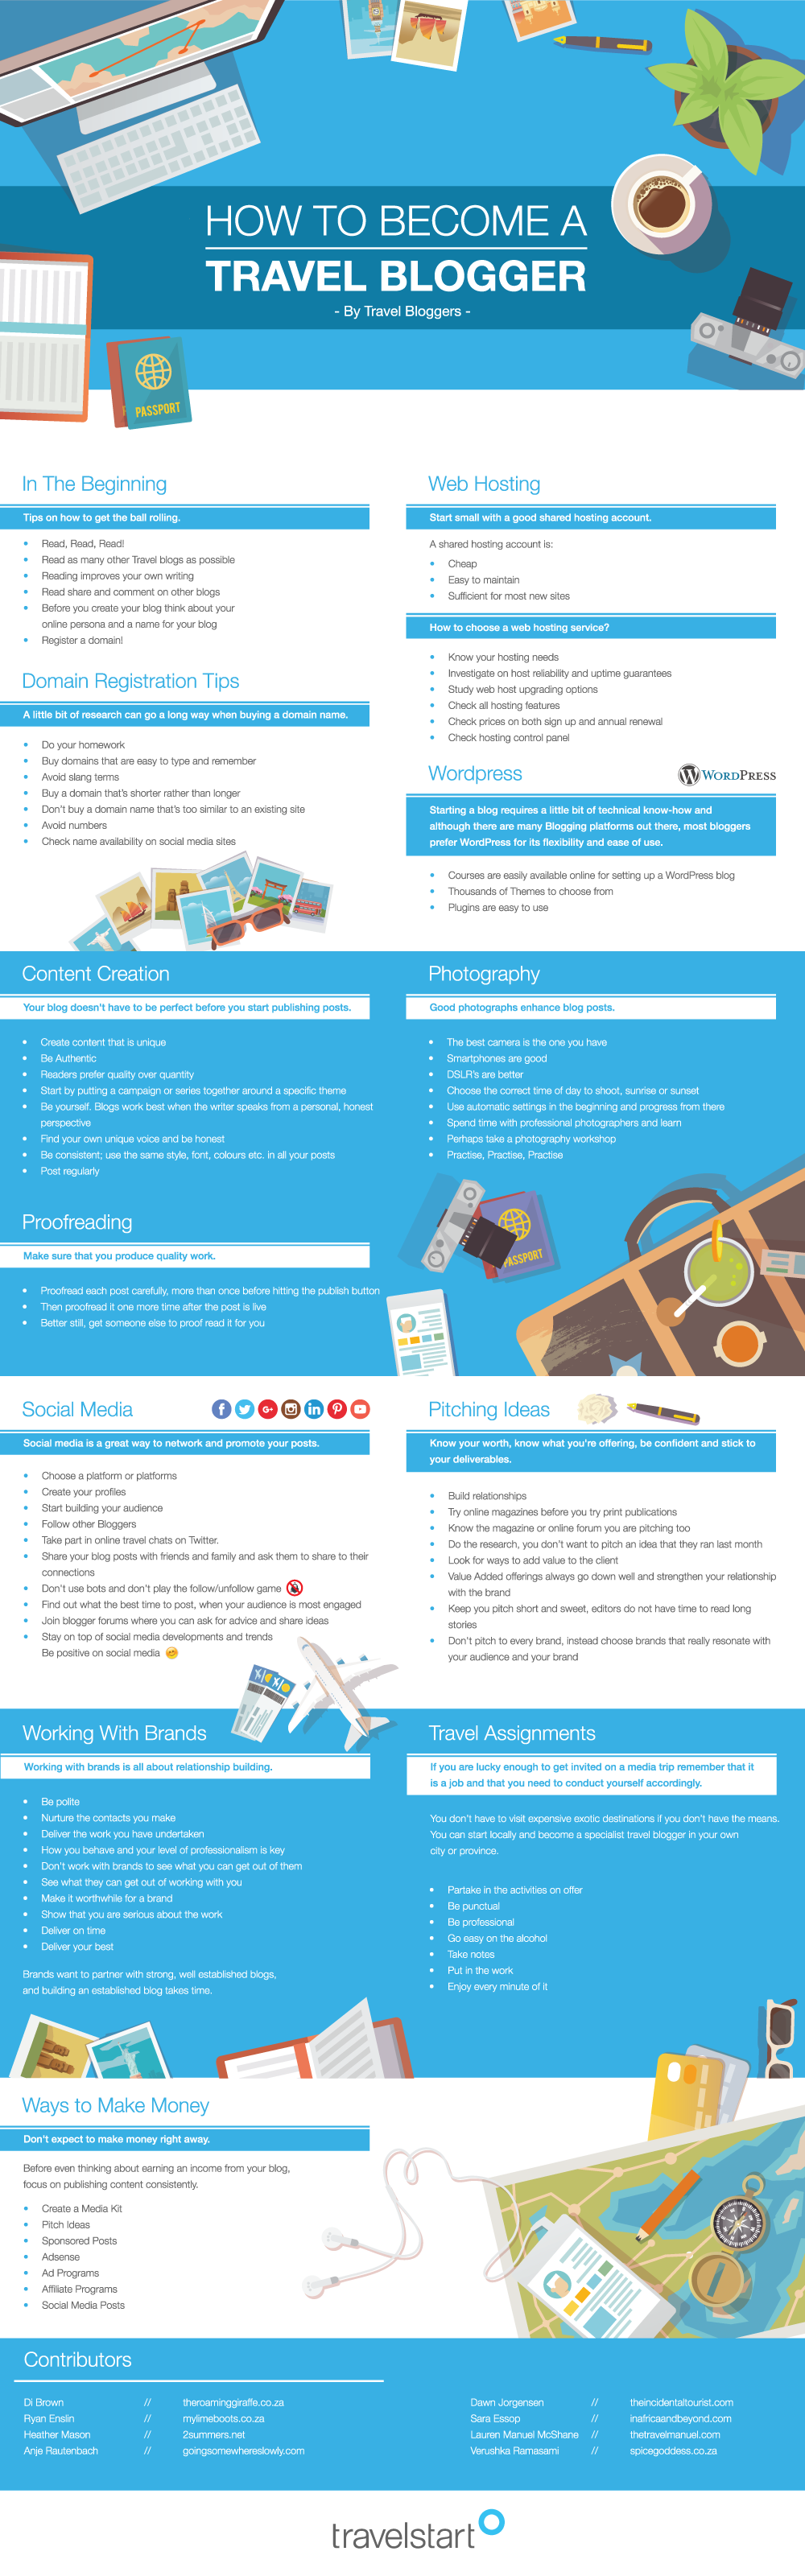 Travelstart Travel Blogging infographic